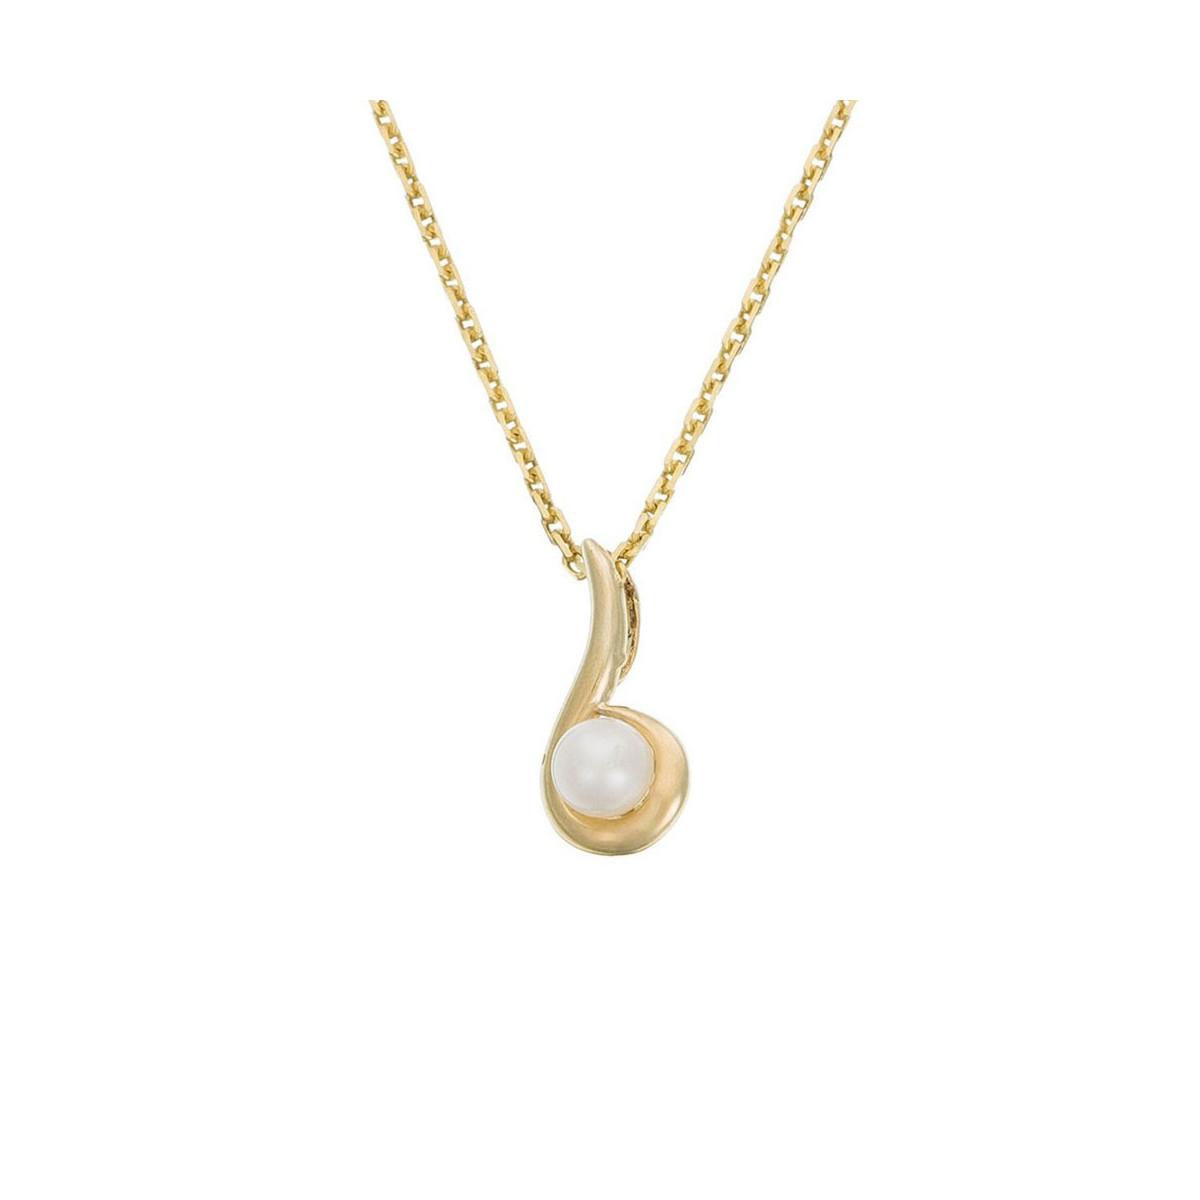 "Pendentif Or Jaune et perle blanche ""Ambiante"" + Chaîne offerte"